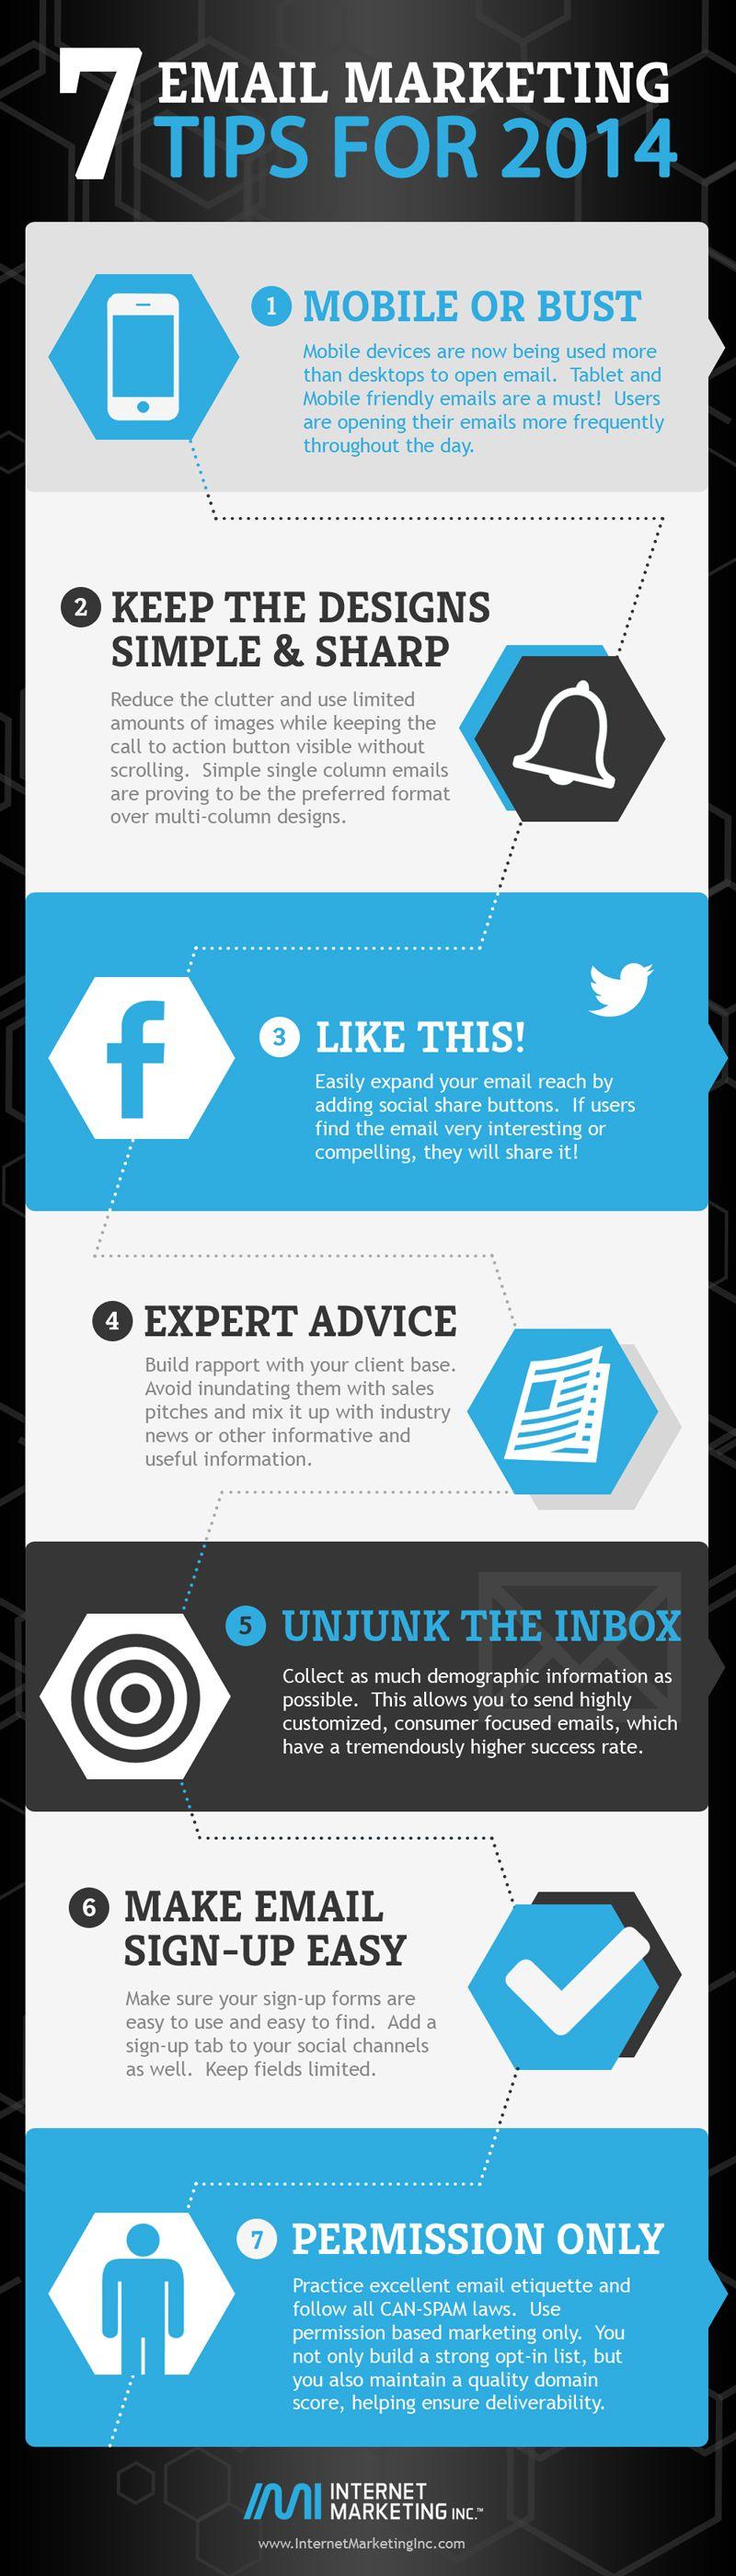 7 Email Marketing Tips for 2014 #emailmarketing #webdesign #interactivedesign #designinspiration